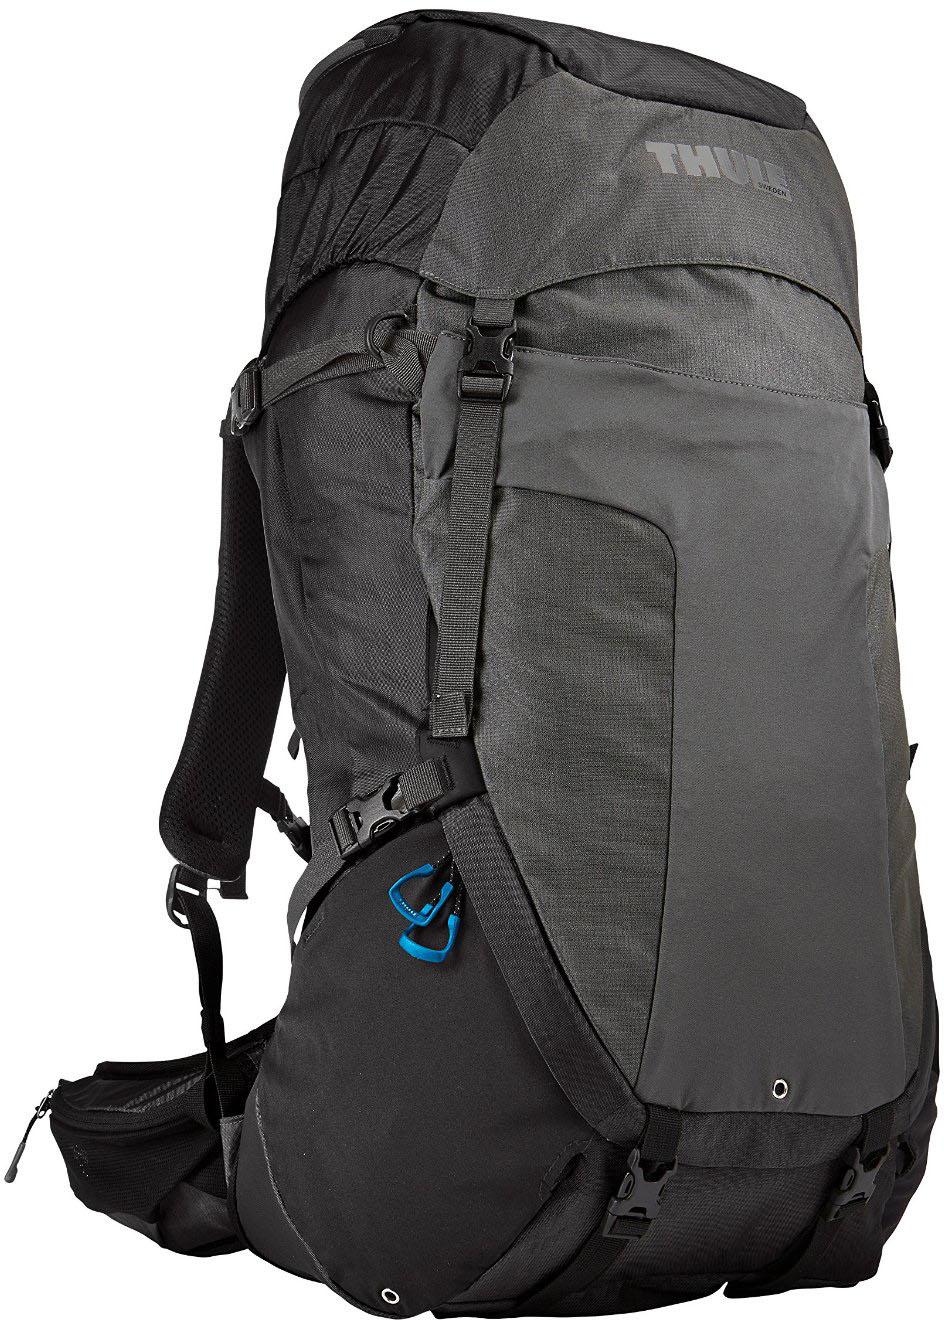 Thule Capstone Women's Hiking Pack 50L  (206702) - женский треккинговый рюкзак (Dark Shadow/Slate)